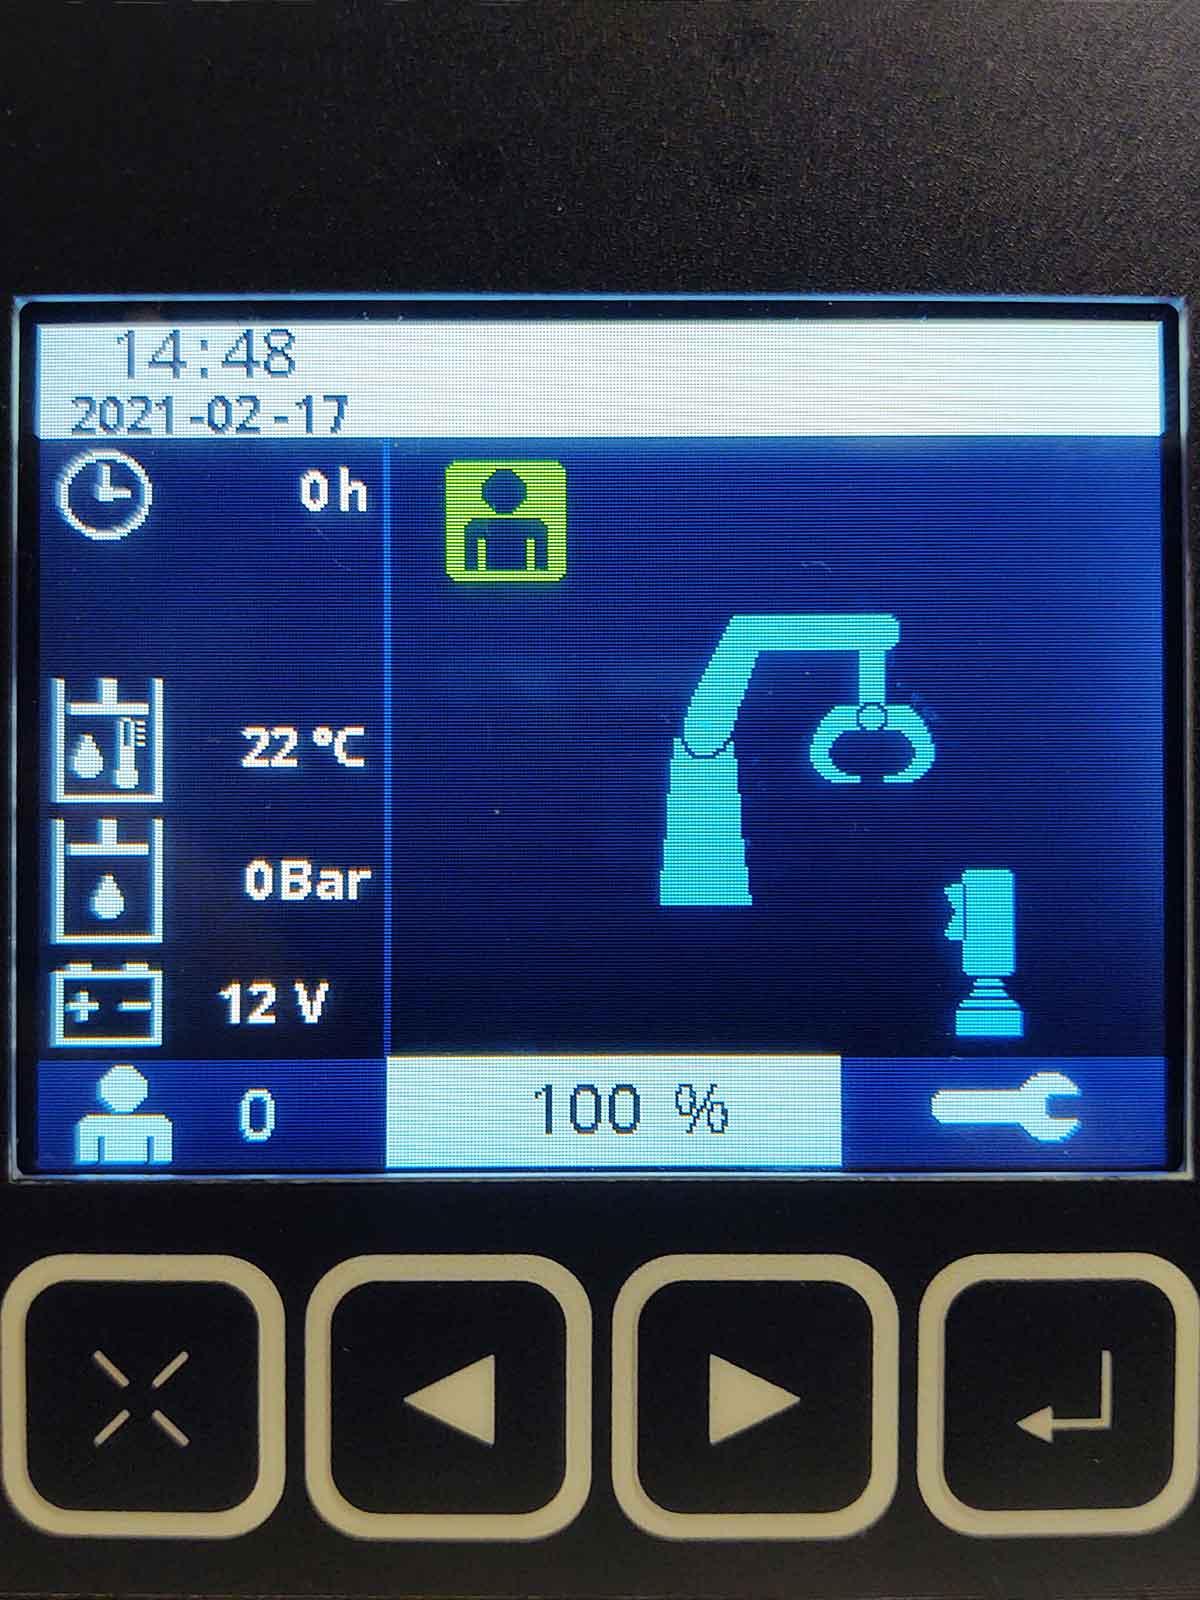 xCrane TDC130 display